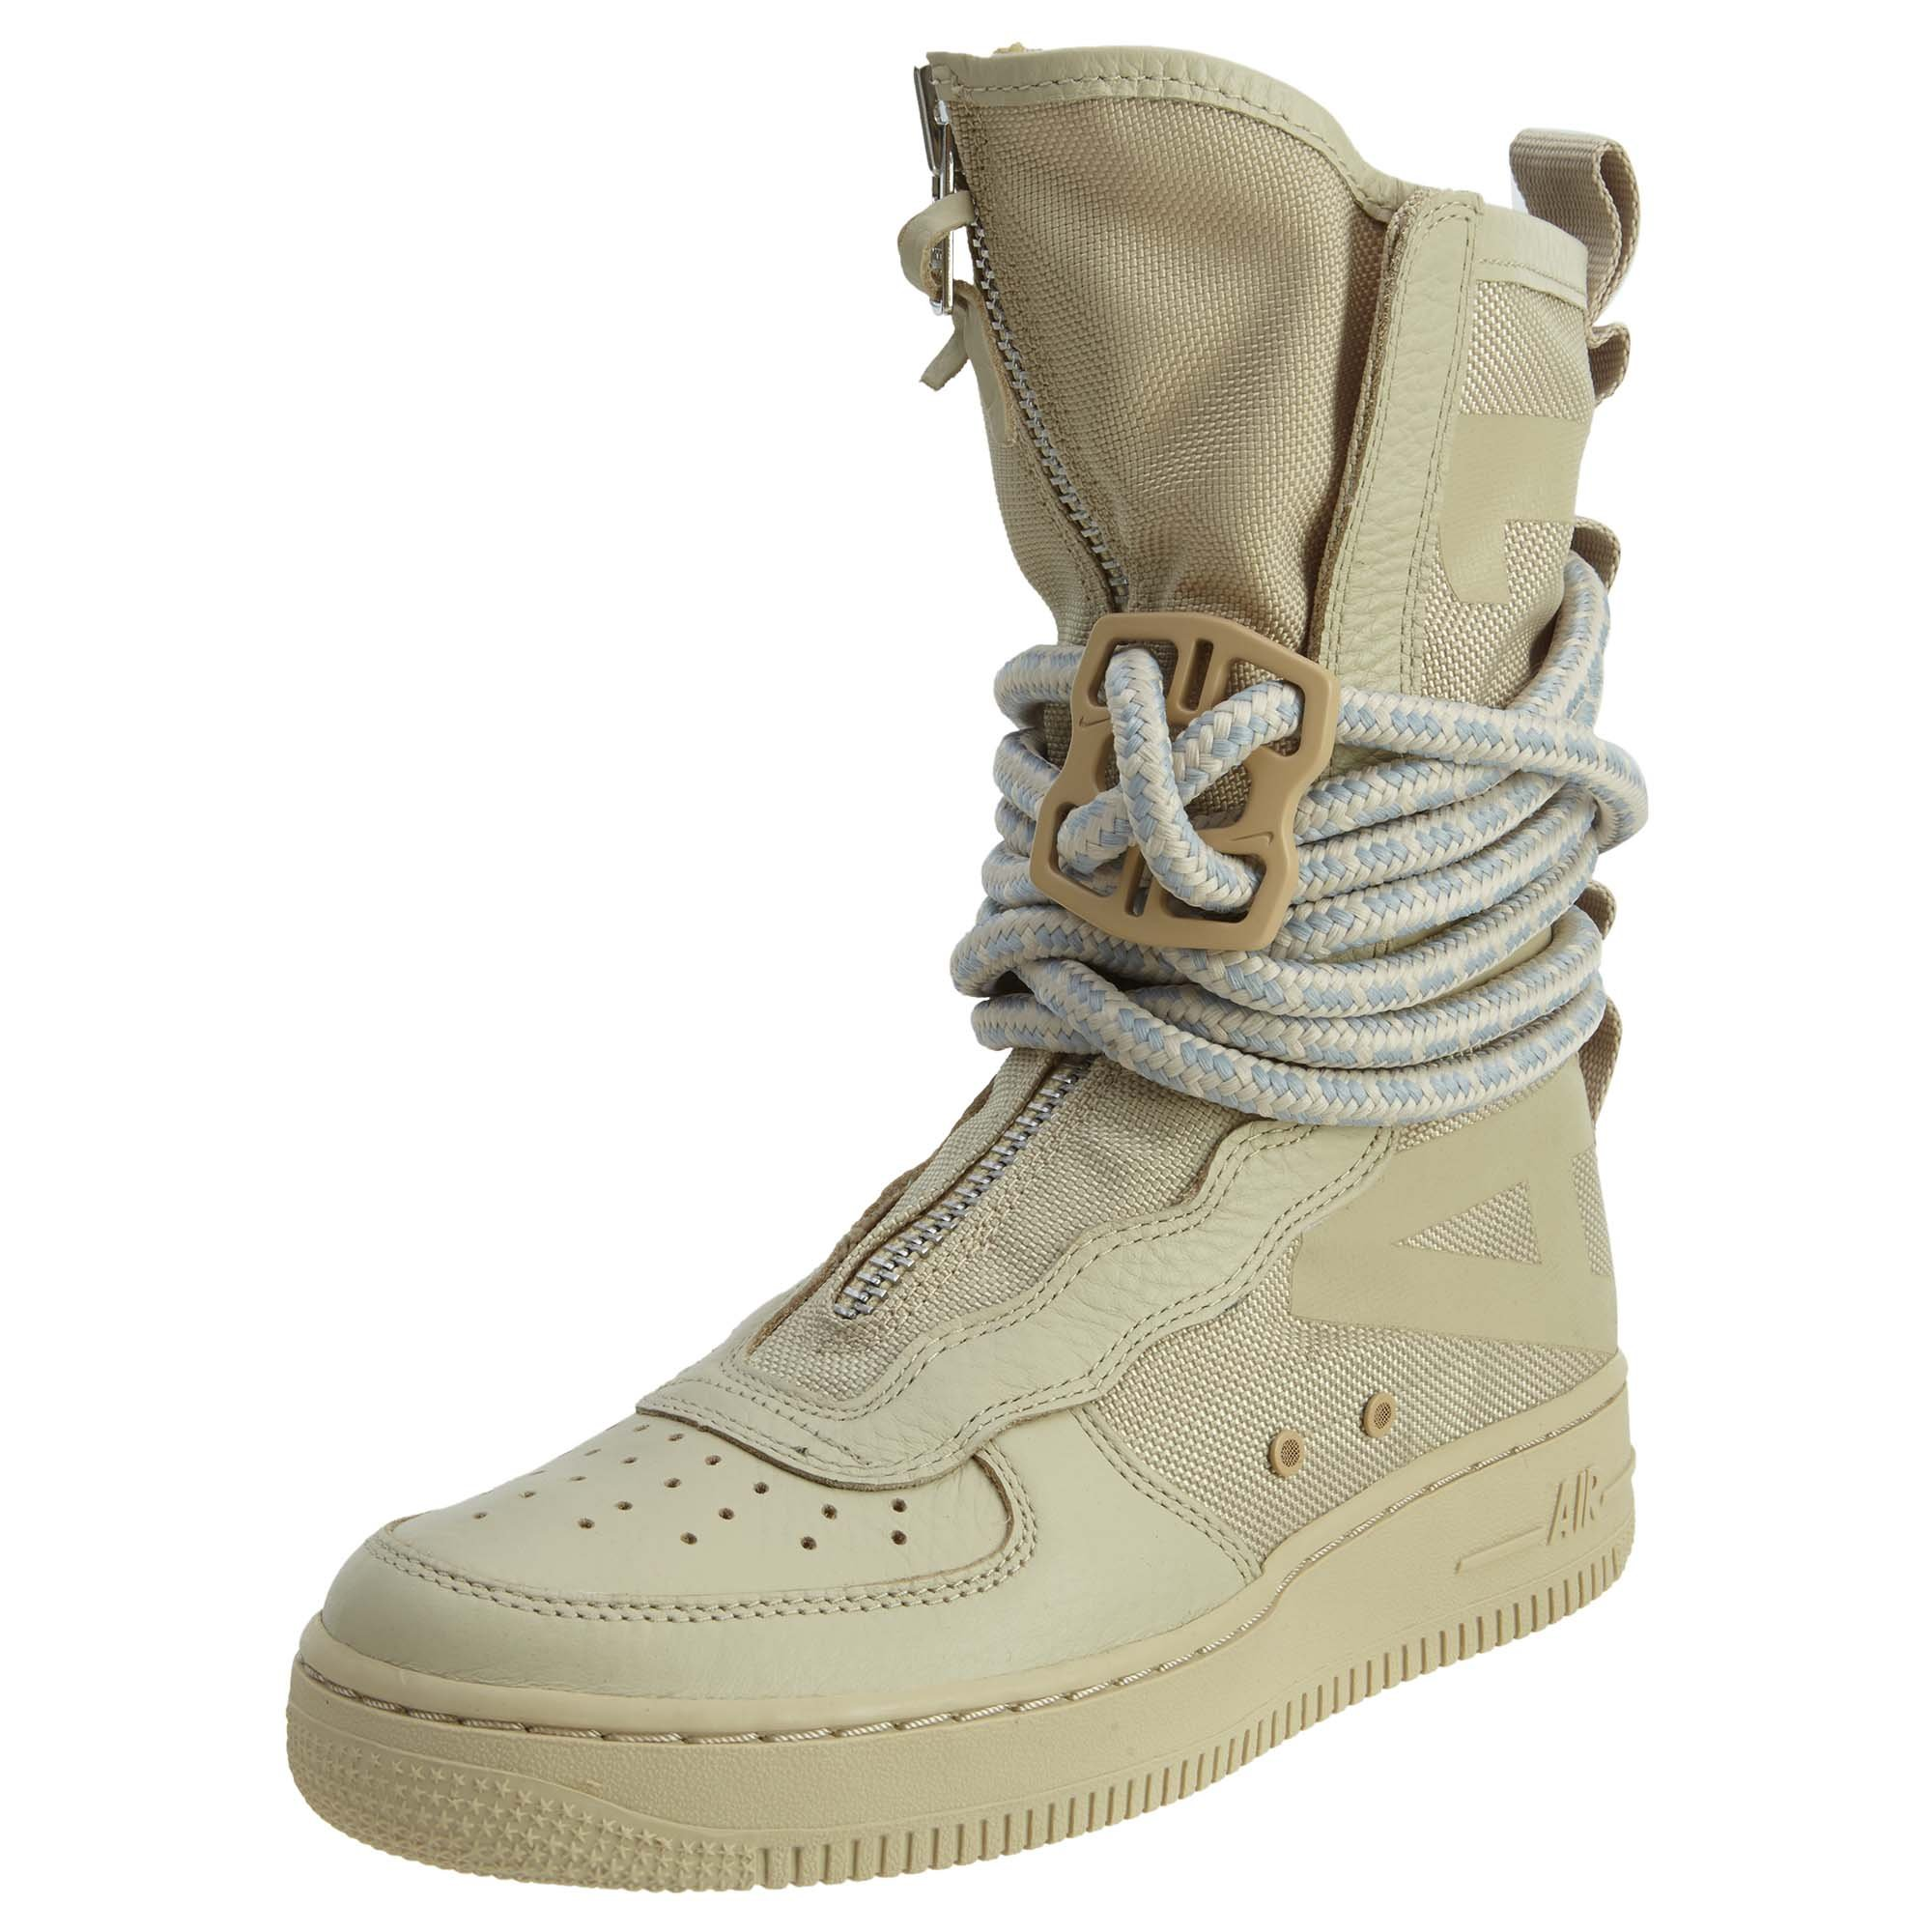 Nike Sf Af1 Hi Womens Style : AA3965-200 Size : 8.5 B(M) US by NIKE (Image #1)